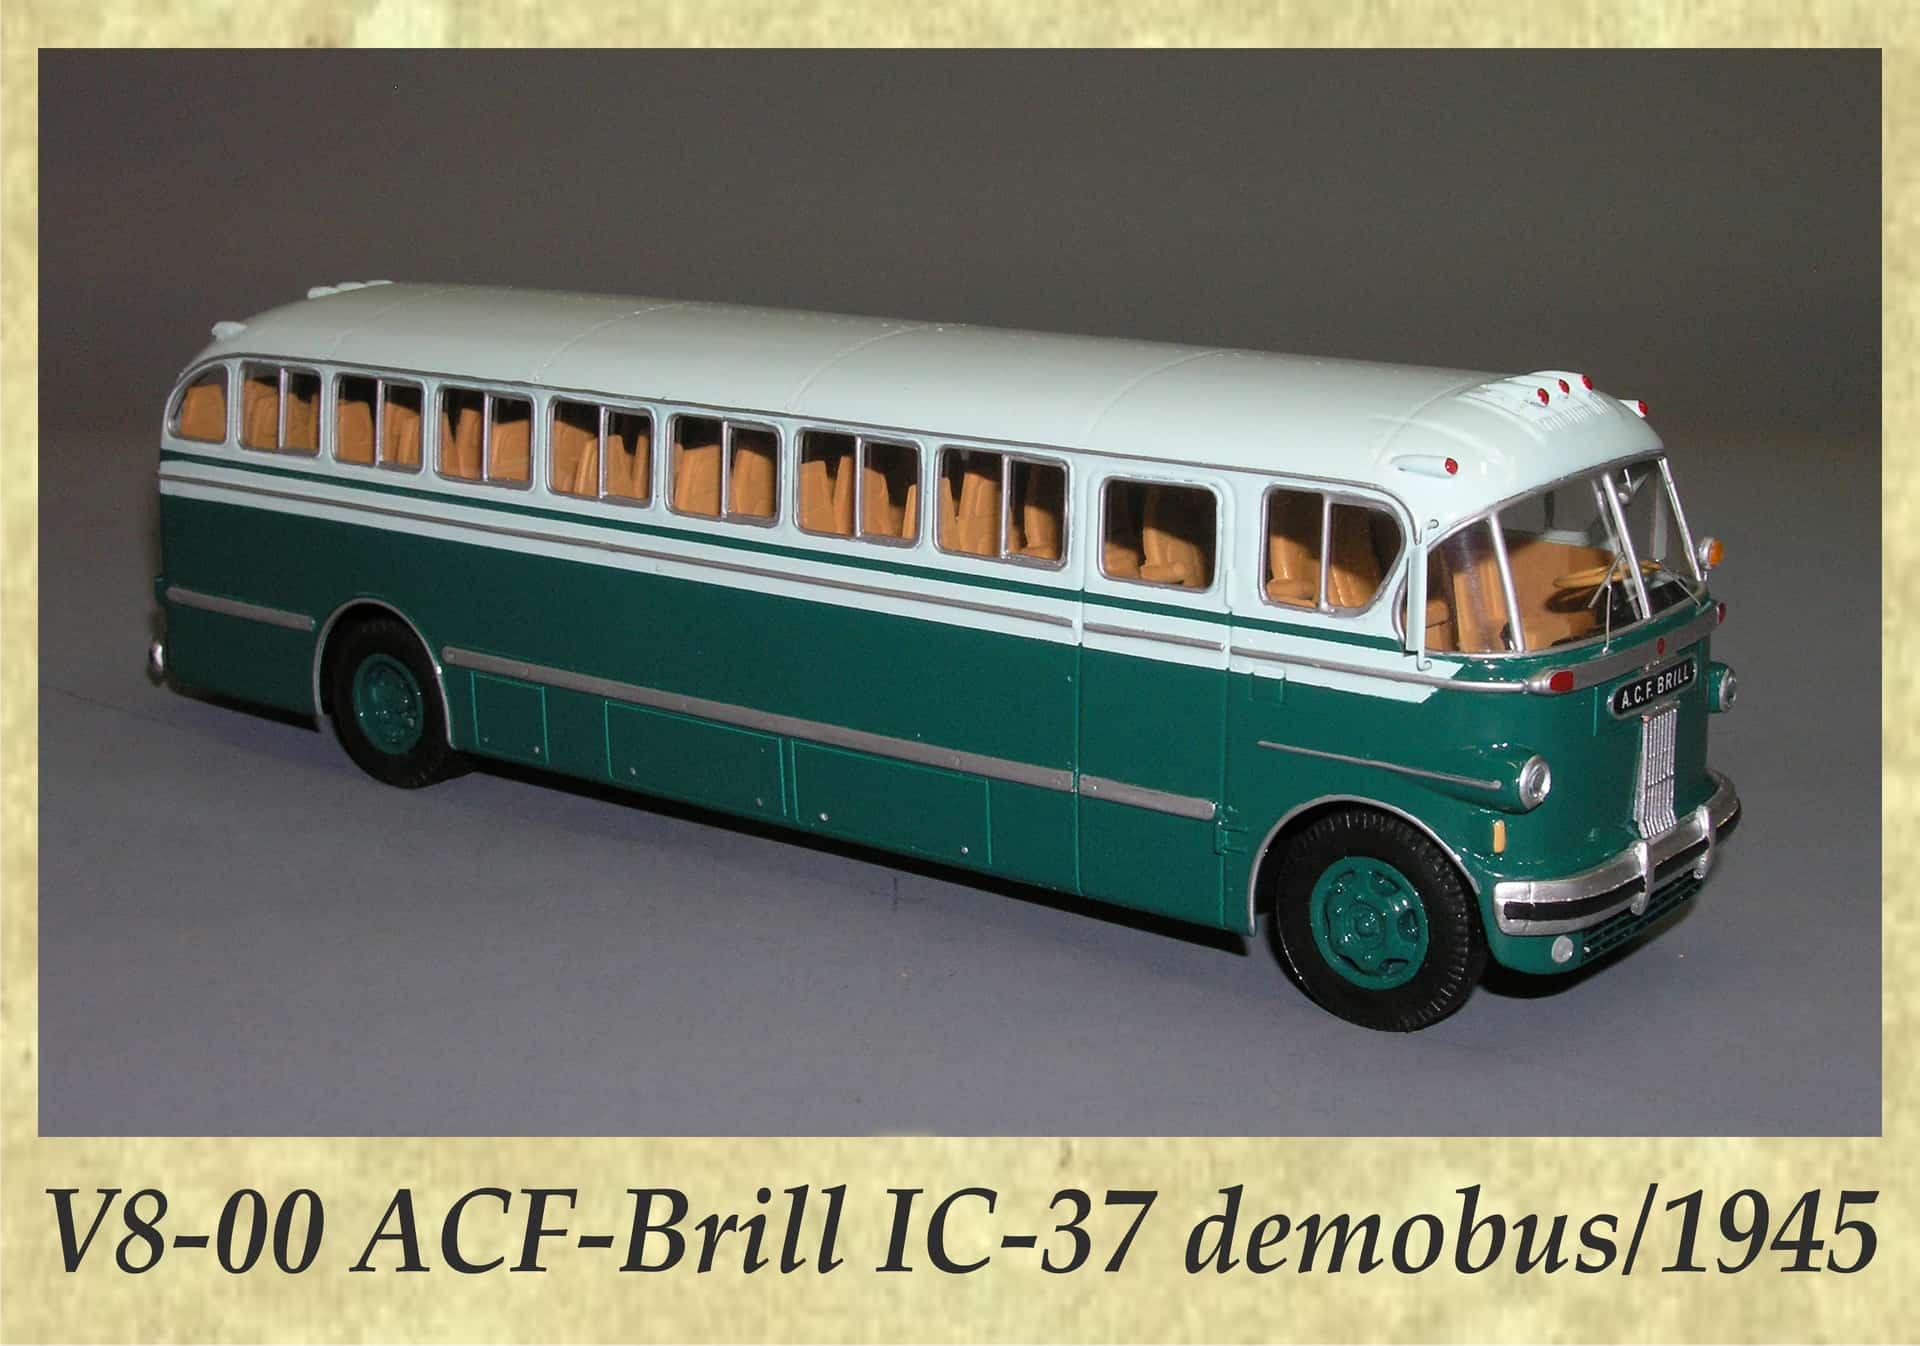 V8-00 ACF-Brill IC-37 demobus_1945